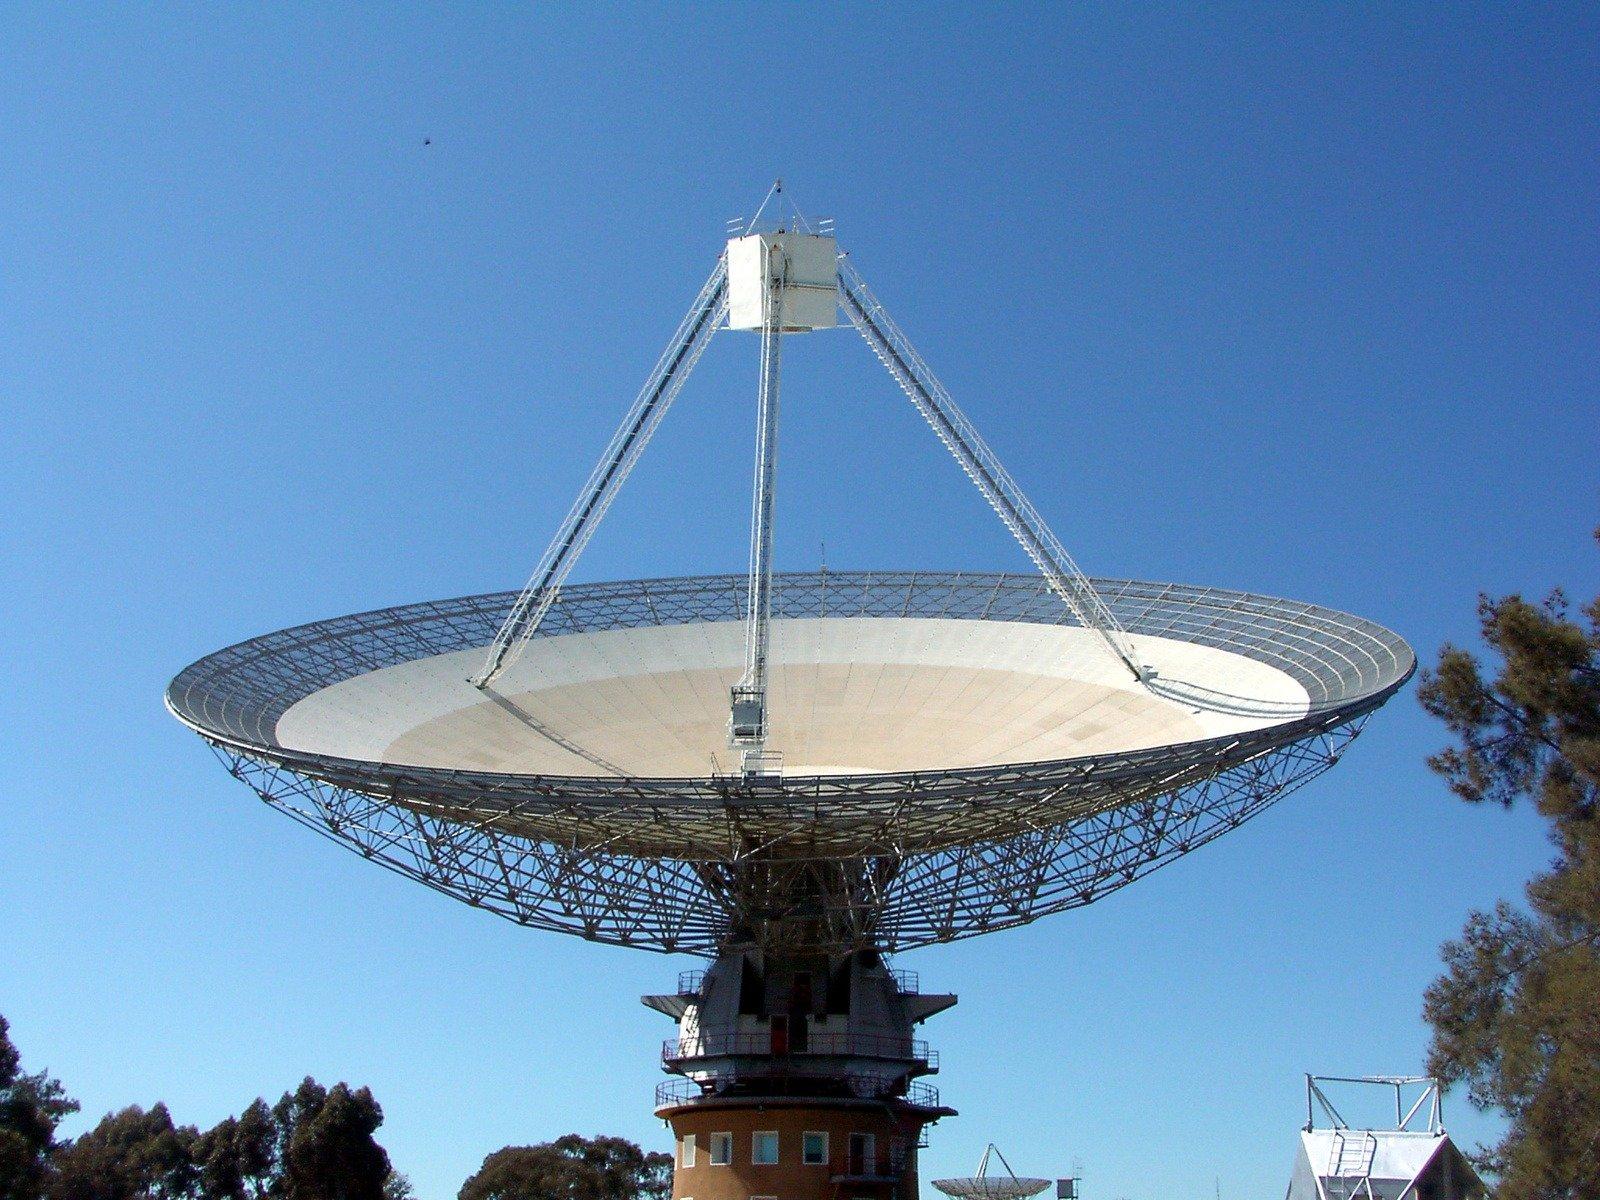 One of the big single dish radio telescopes